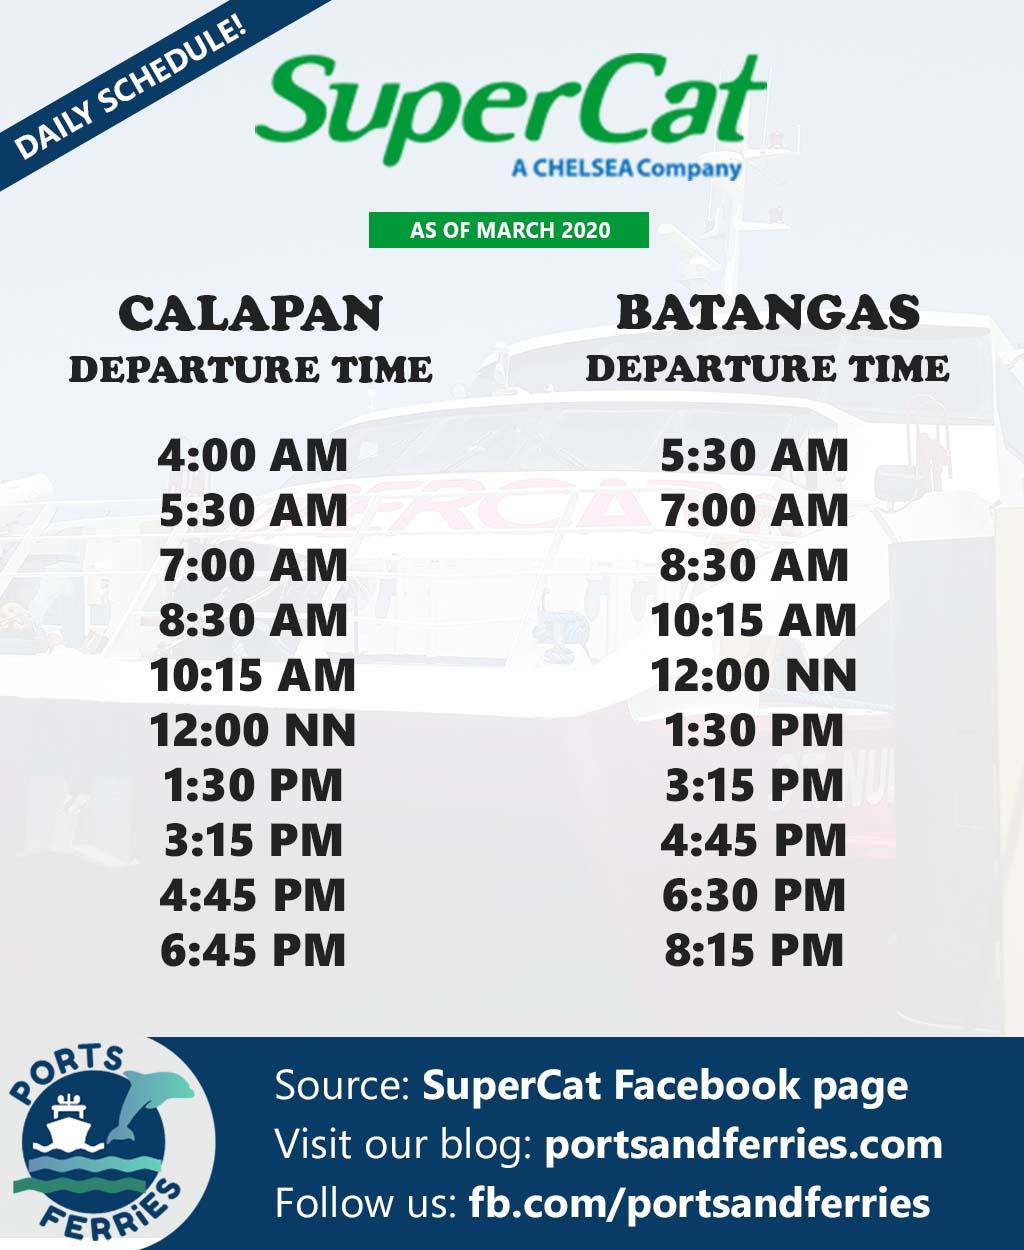 SuperCat Calapan-Batangas Ferry Schedule